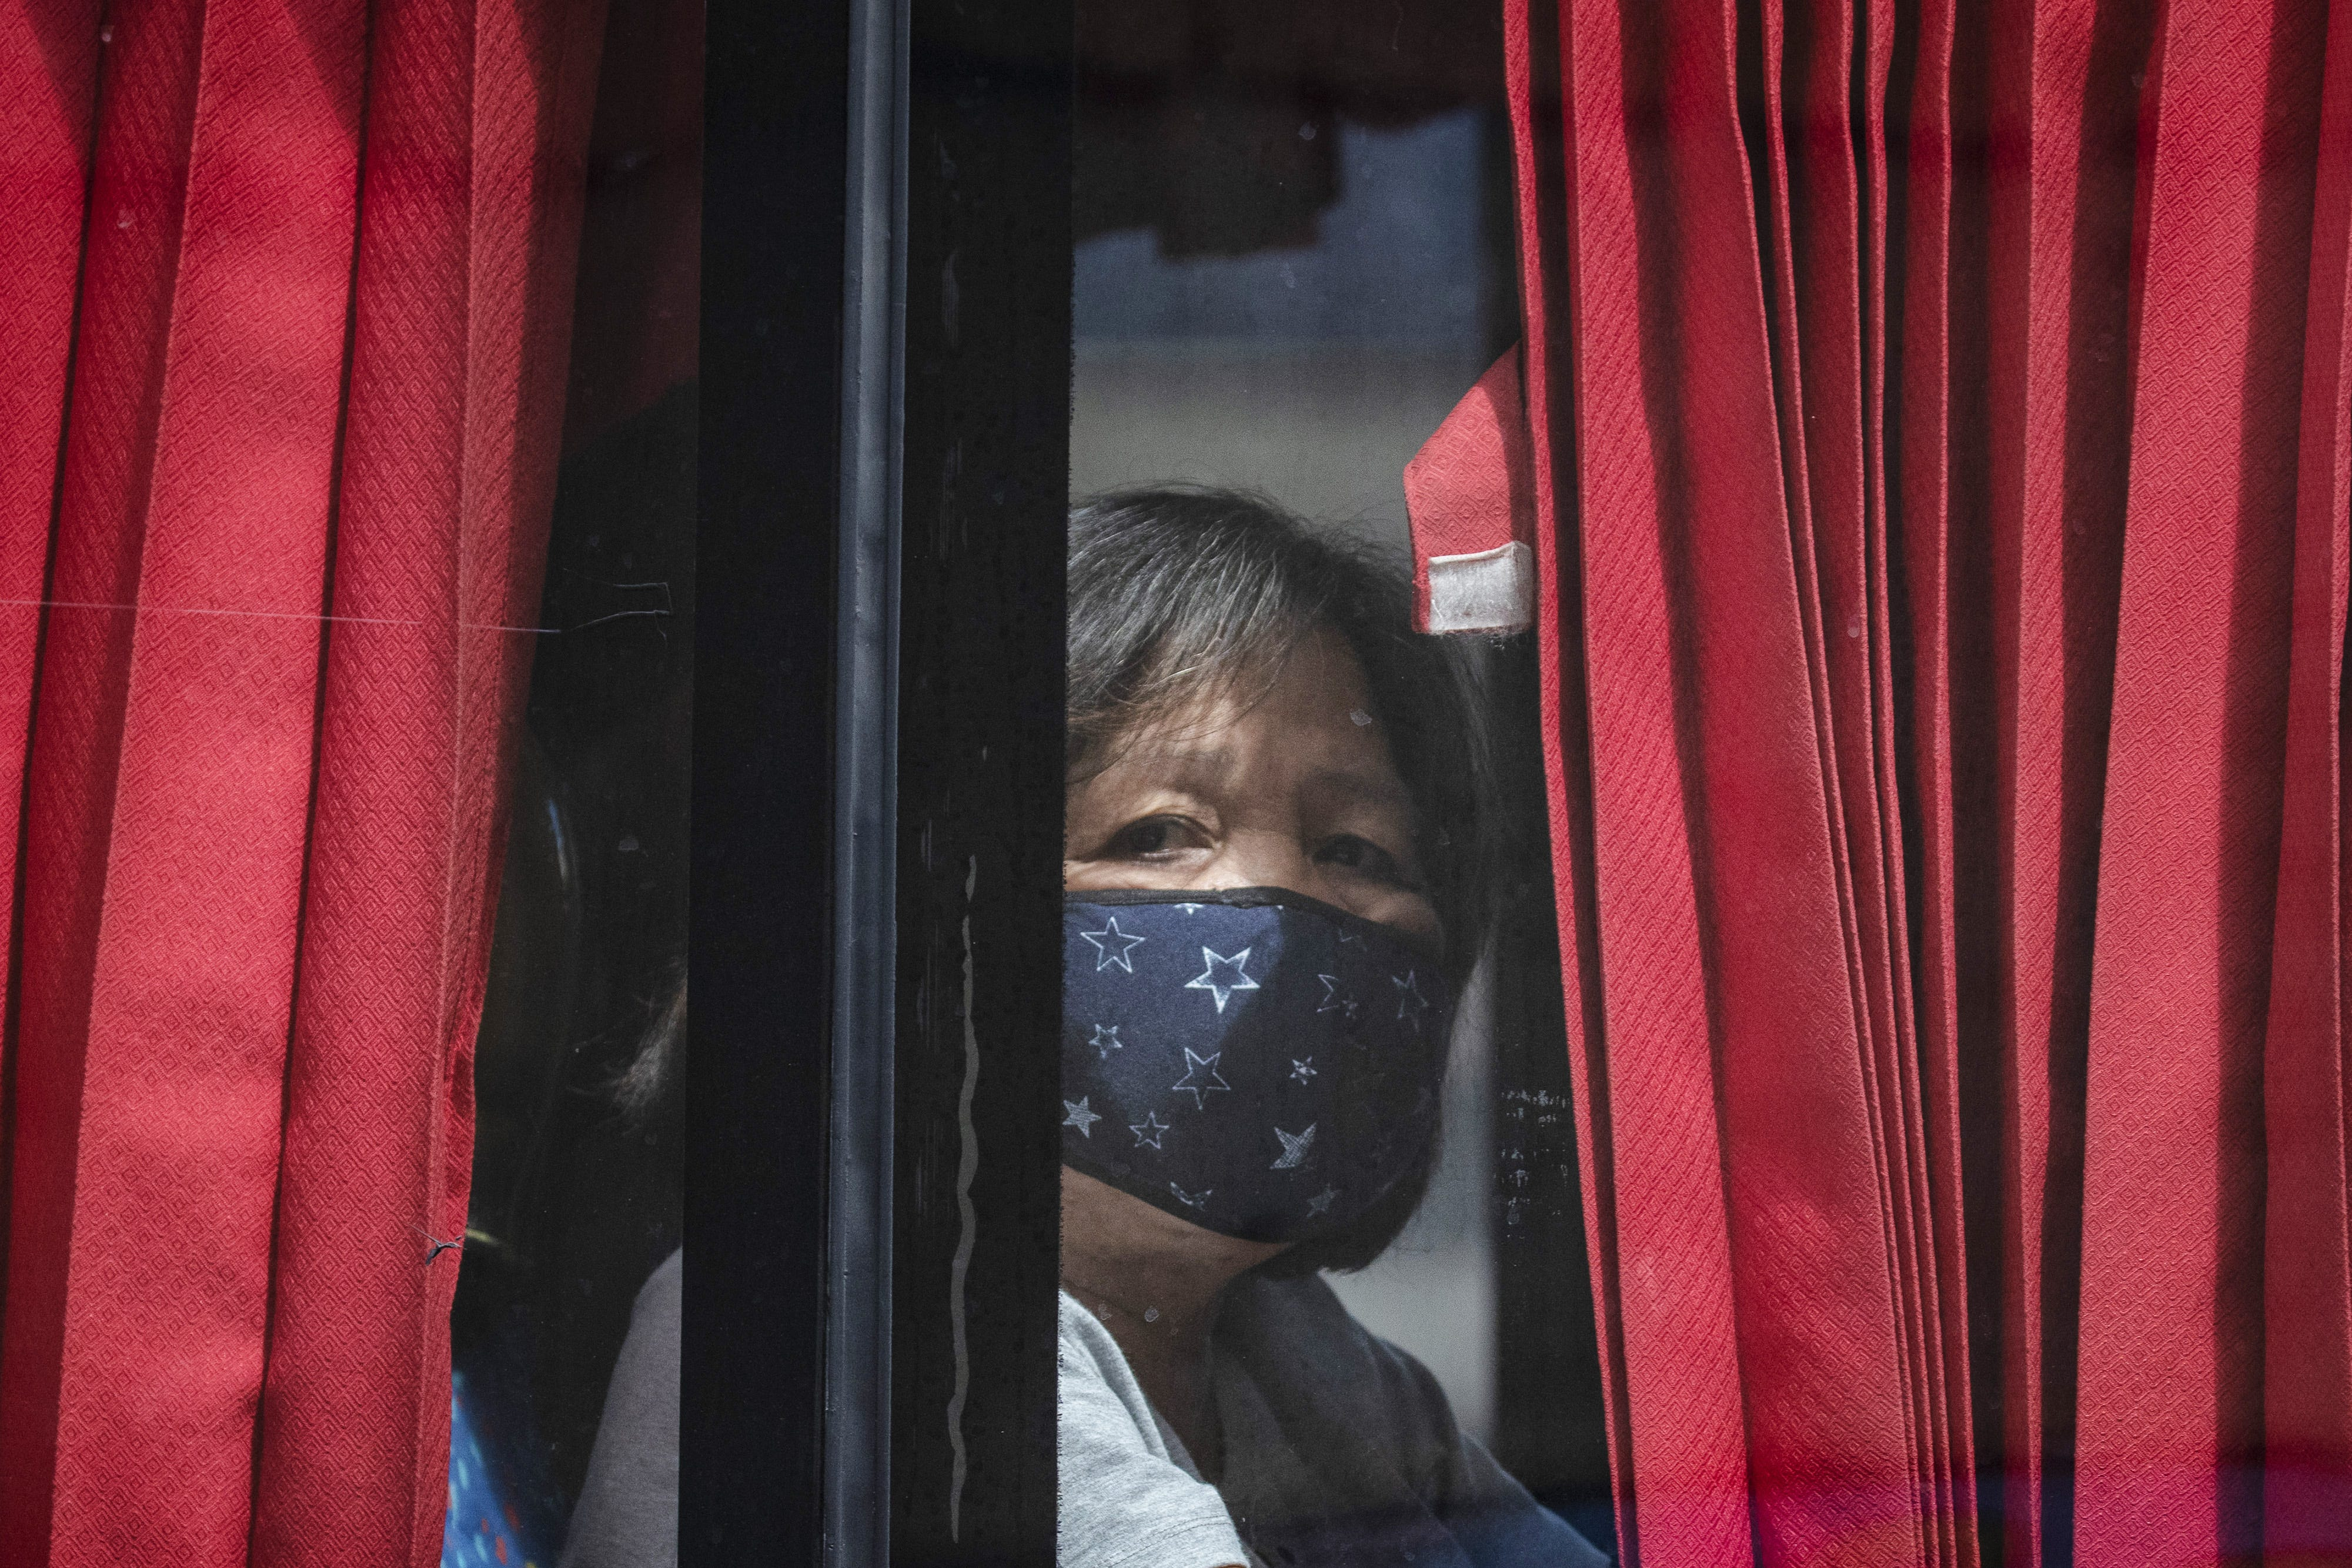 Deadly coronavirus spreading across China reaches US